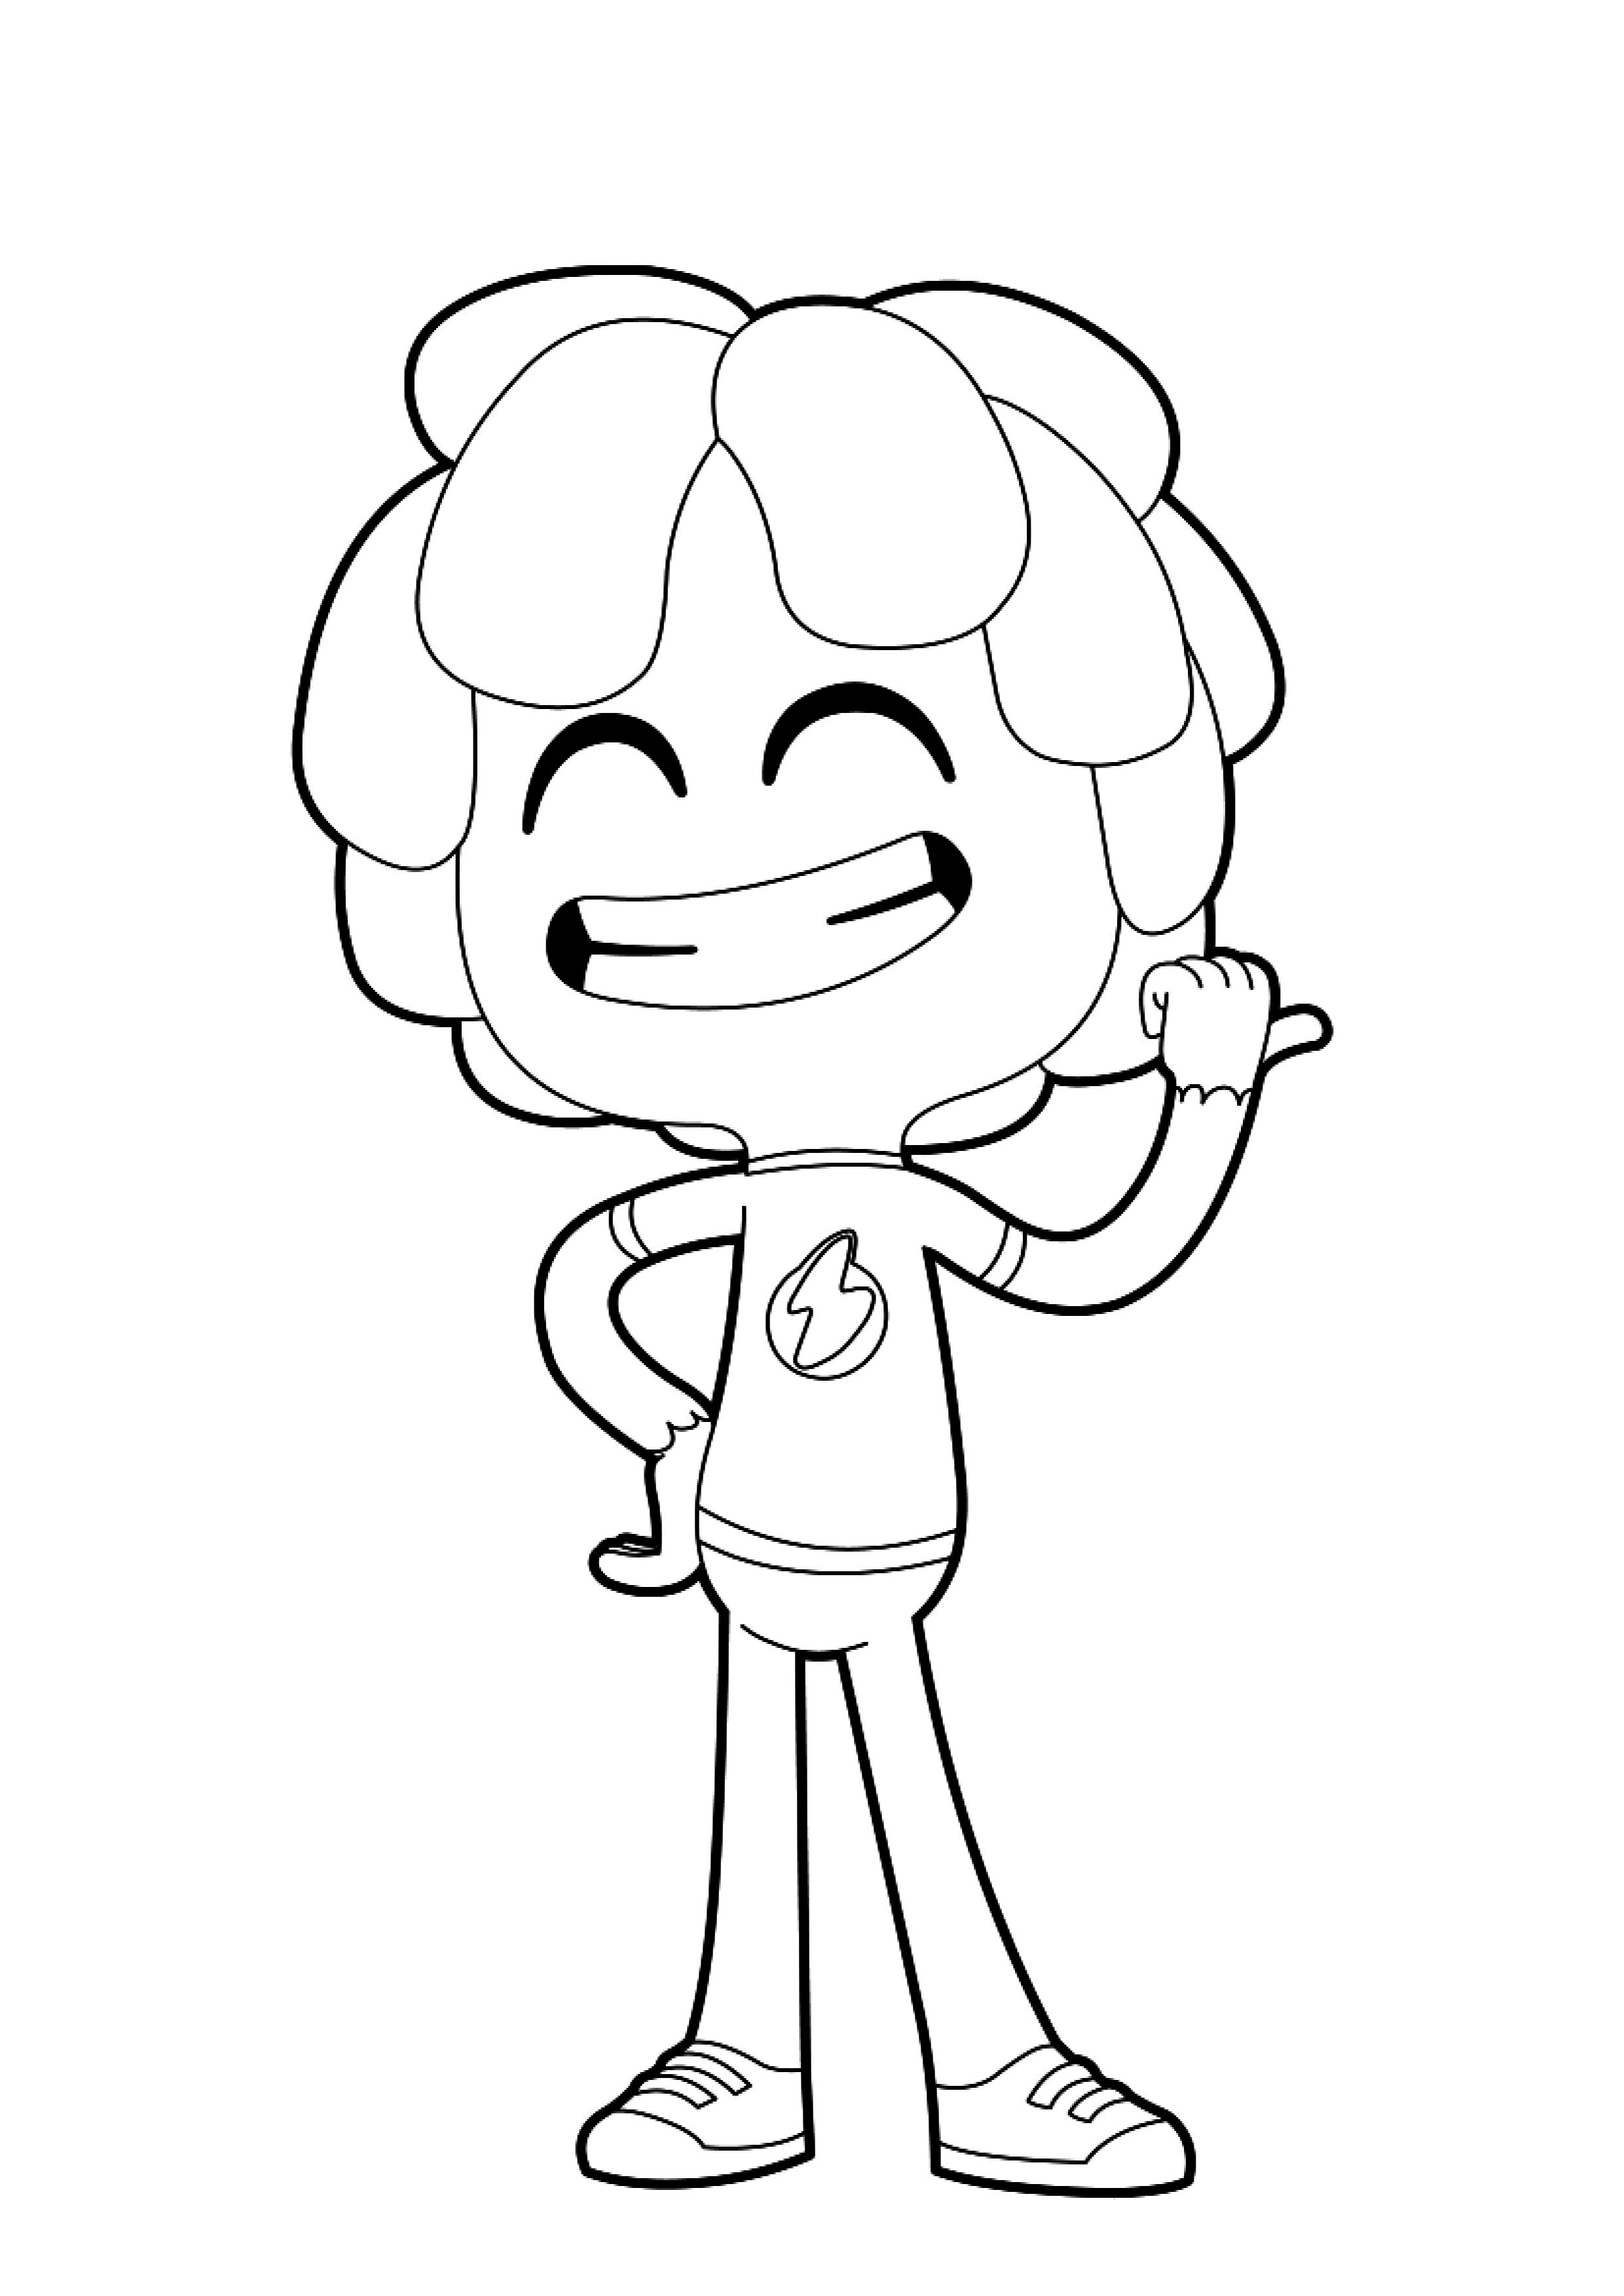 desenhos para colorir jelly jamm